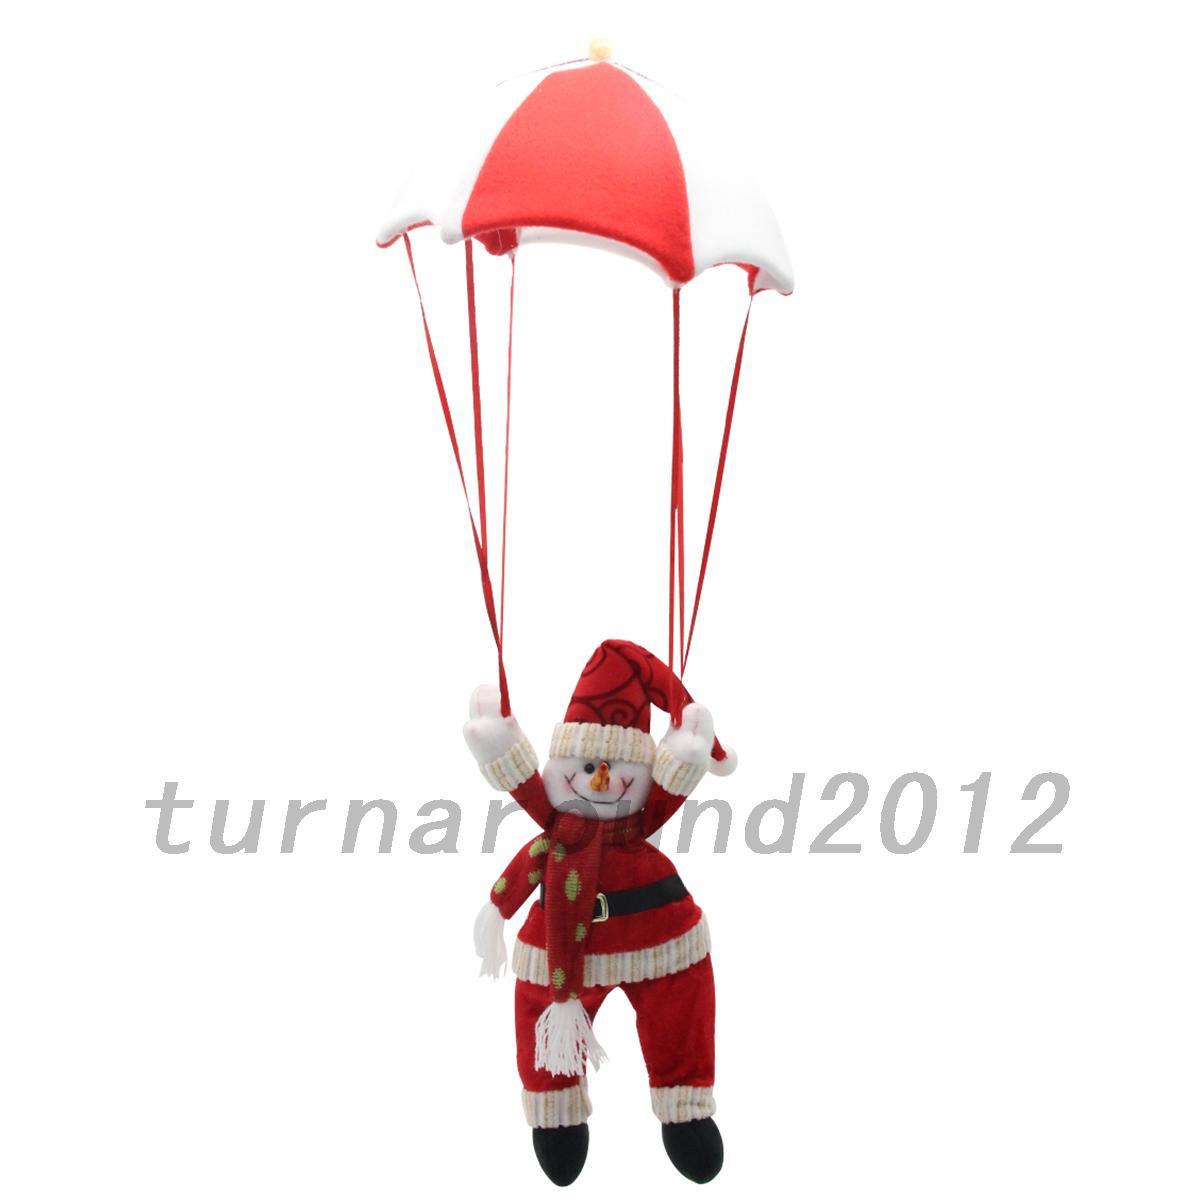 Christmas tree hanging decorations new parachute santa claus snowman - New Santa Claus Snowman In Parachute Christmas Tree